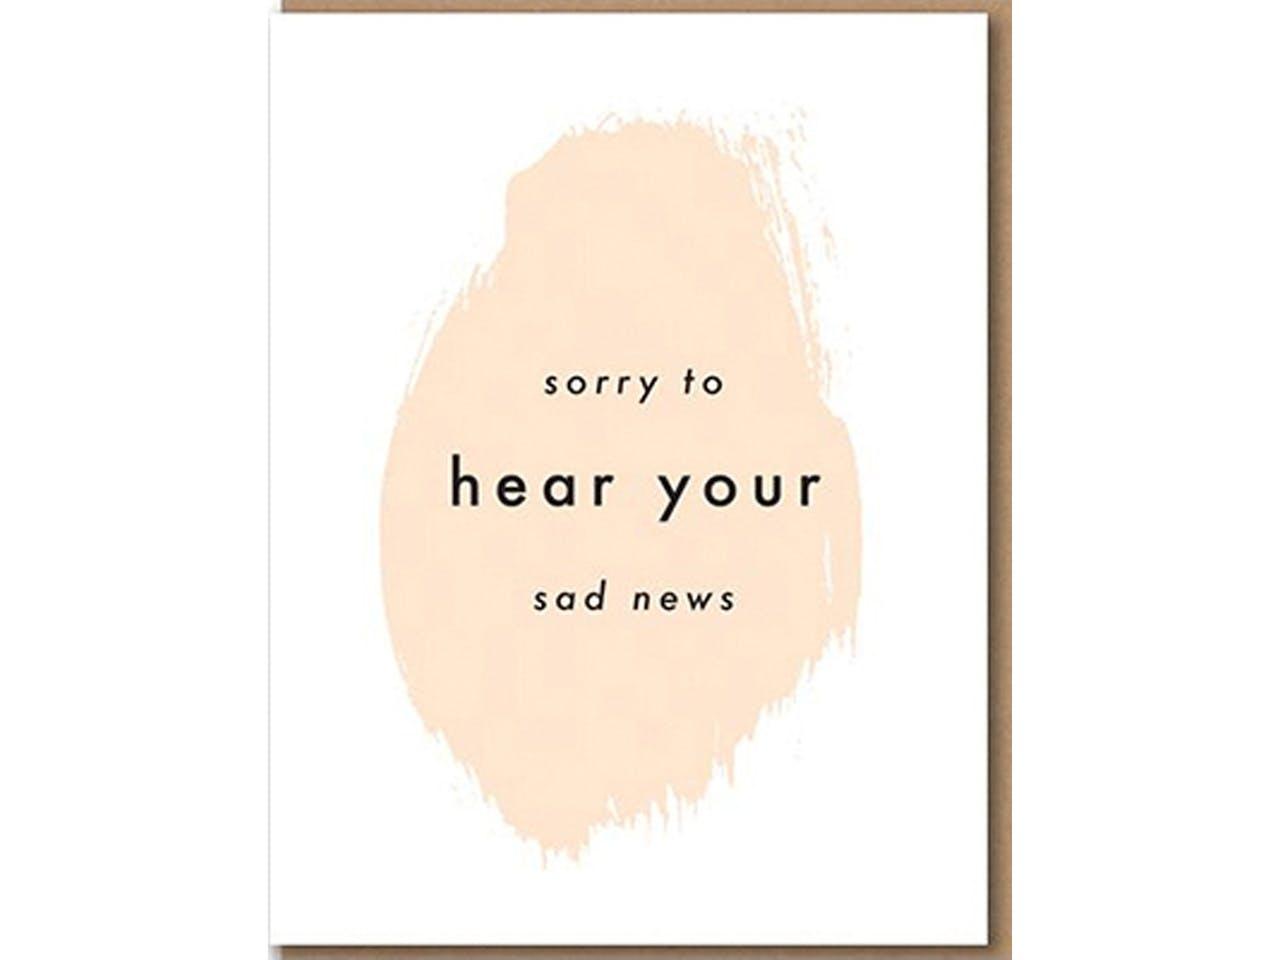 Nineteenseventythree Grußkarte mit Kuvert, DIN A6/C6, Sorry to hear your sad news